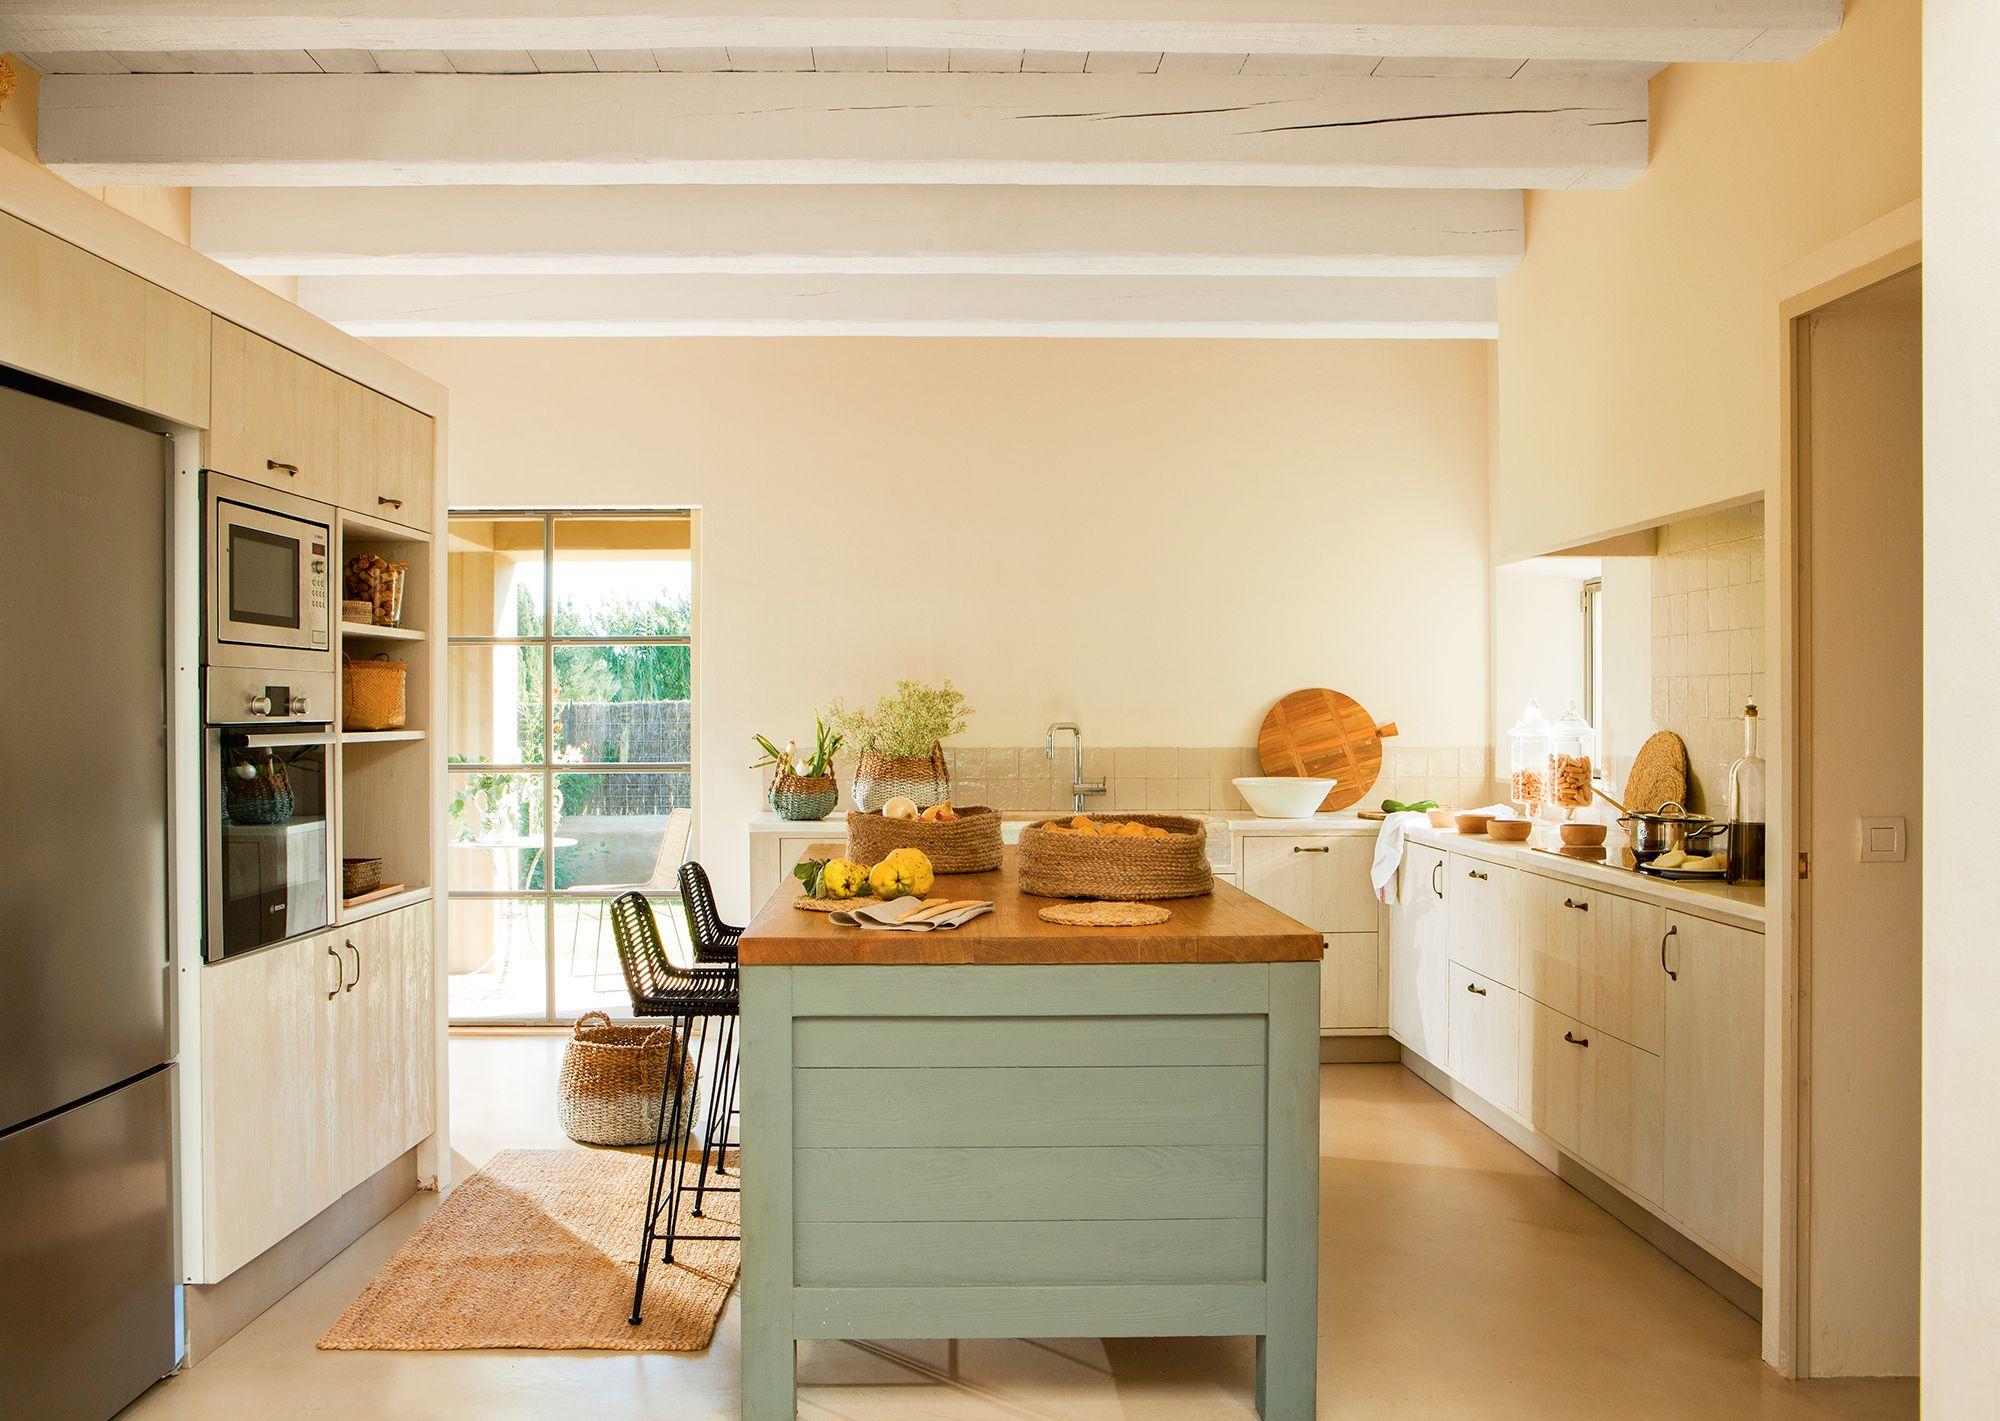 Muebles cocina vintage elegant fabulous muebles - Muebles cocina vintage ...